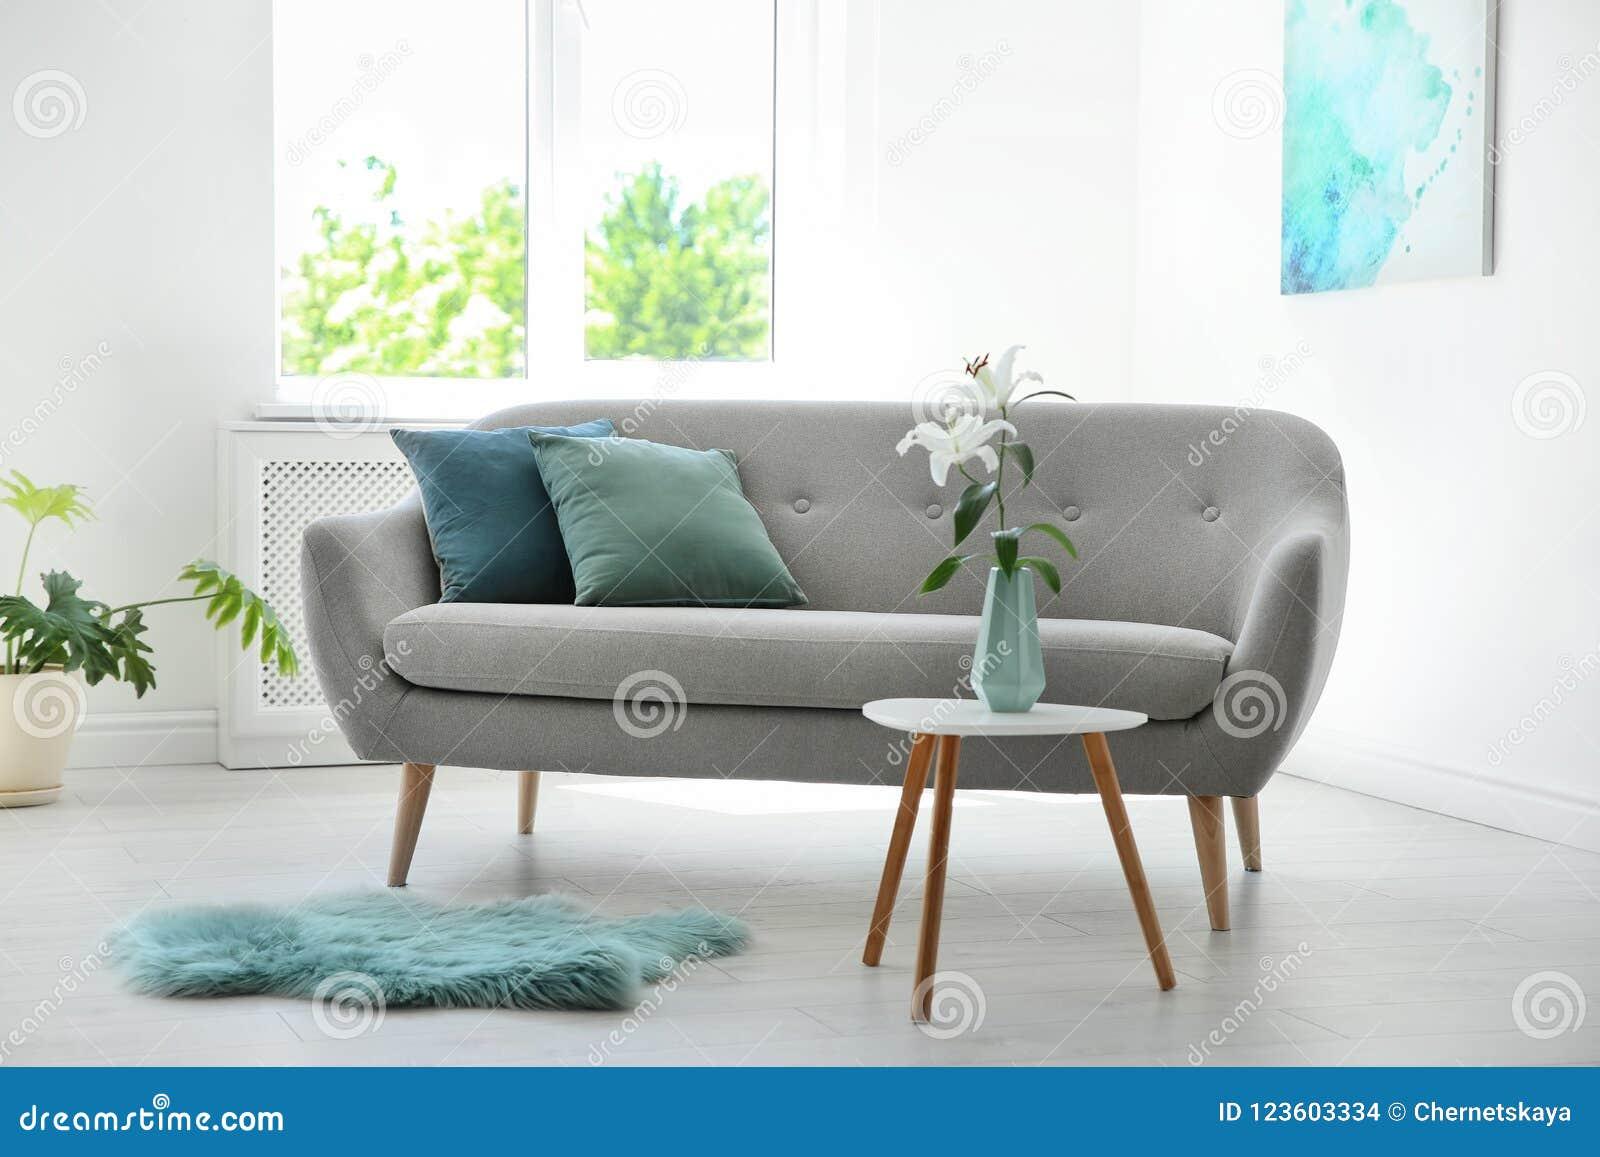 Großartig Sofa Mint Sammlung Von Stylish Living Room Interior With And Decor